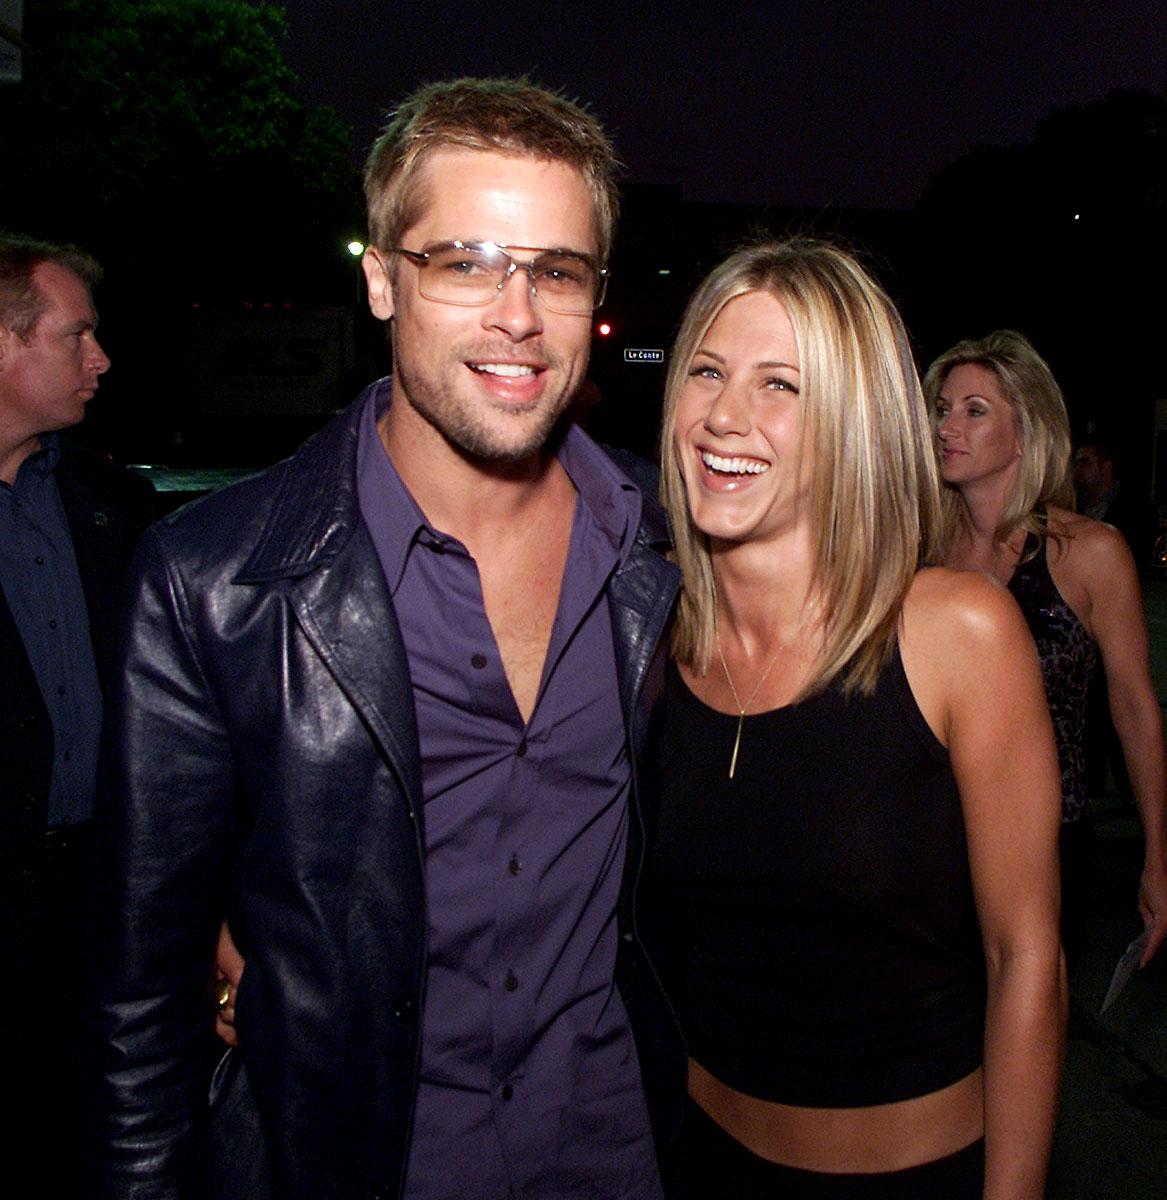 Brad Pitt Seen For 1st Time Since Jennifer Aniston Split With Justin Brad and jen photos